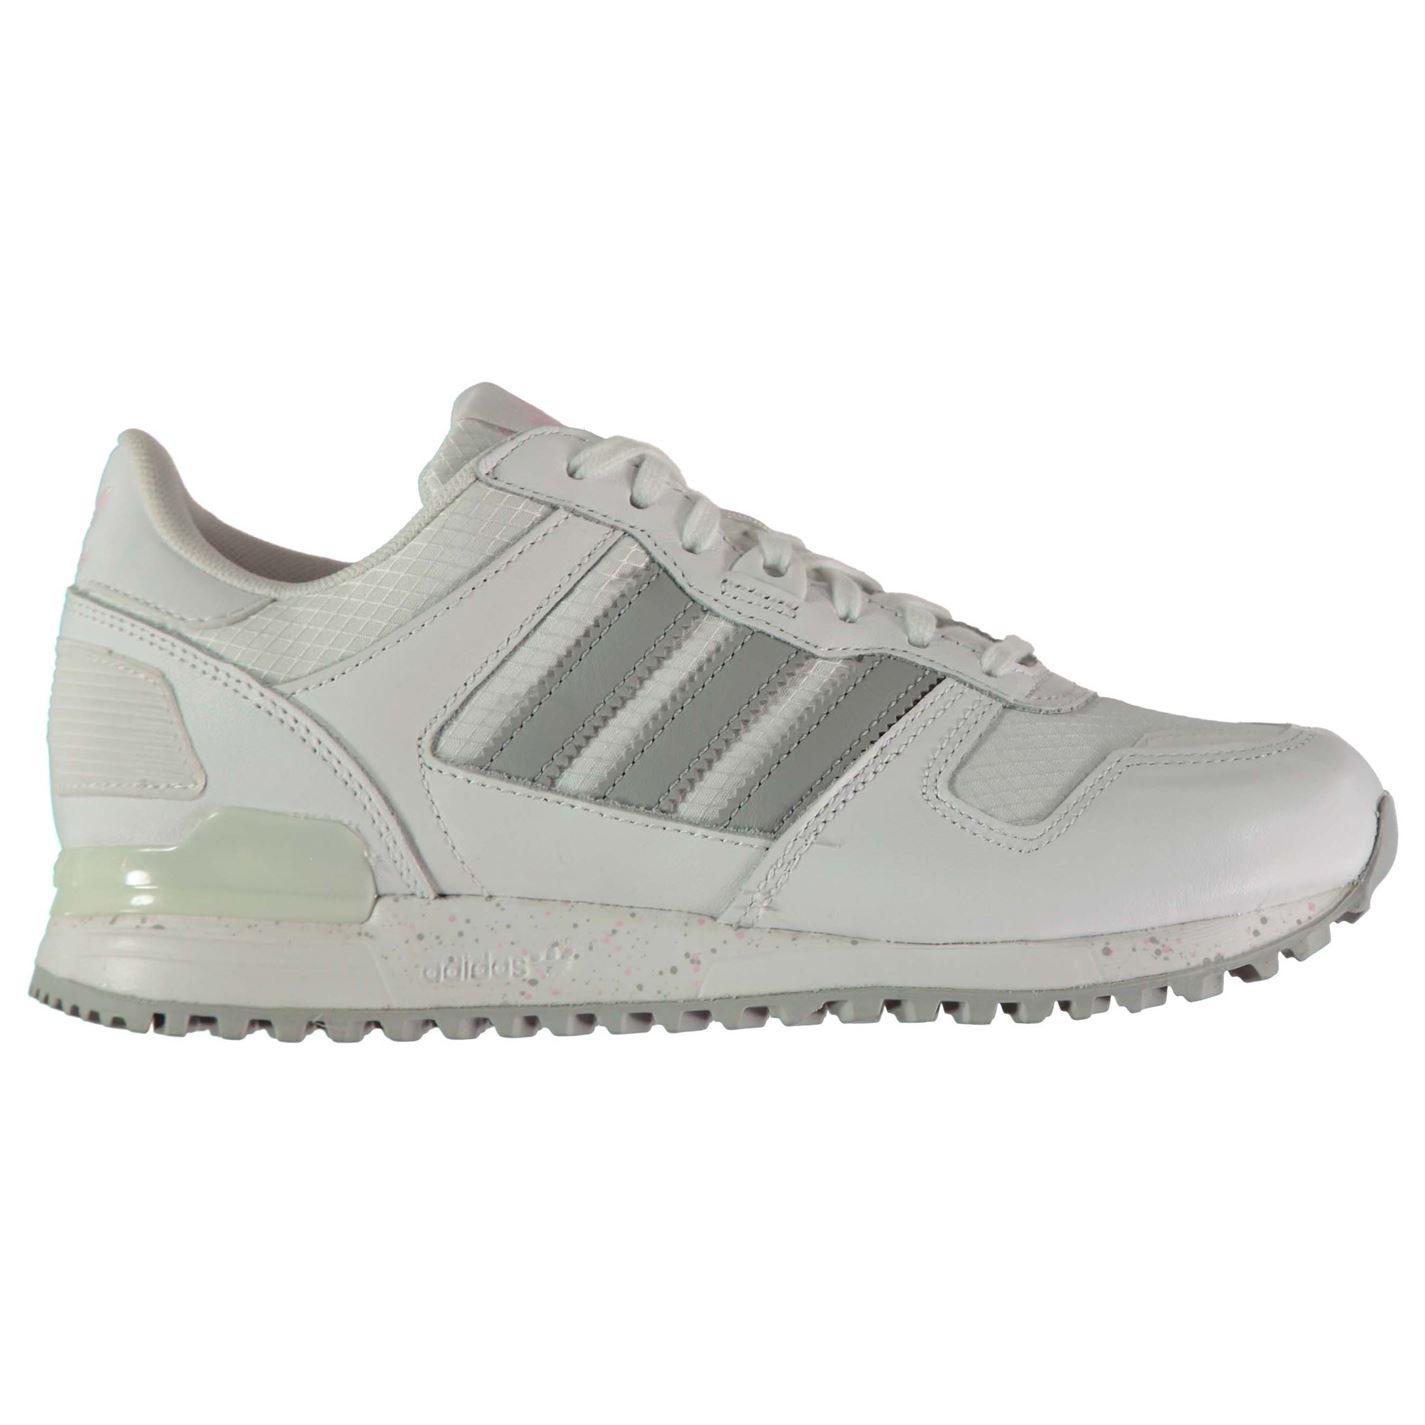 Adidas Originals ZX 700 Ladies Trainers